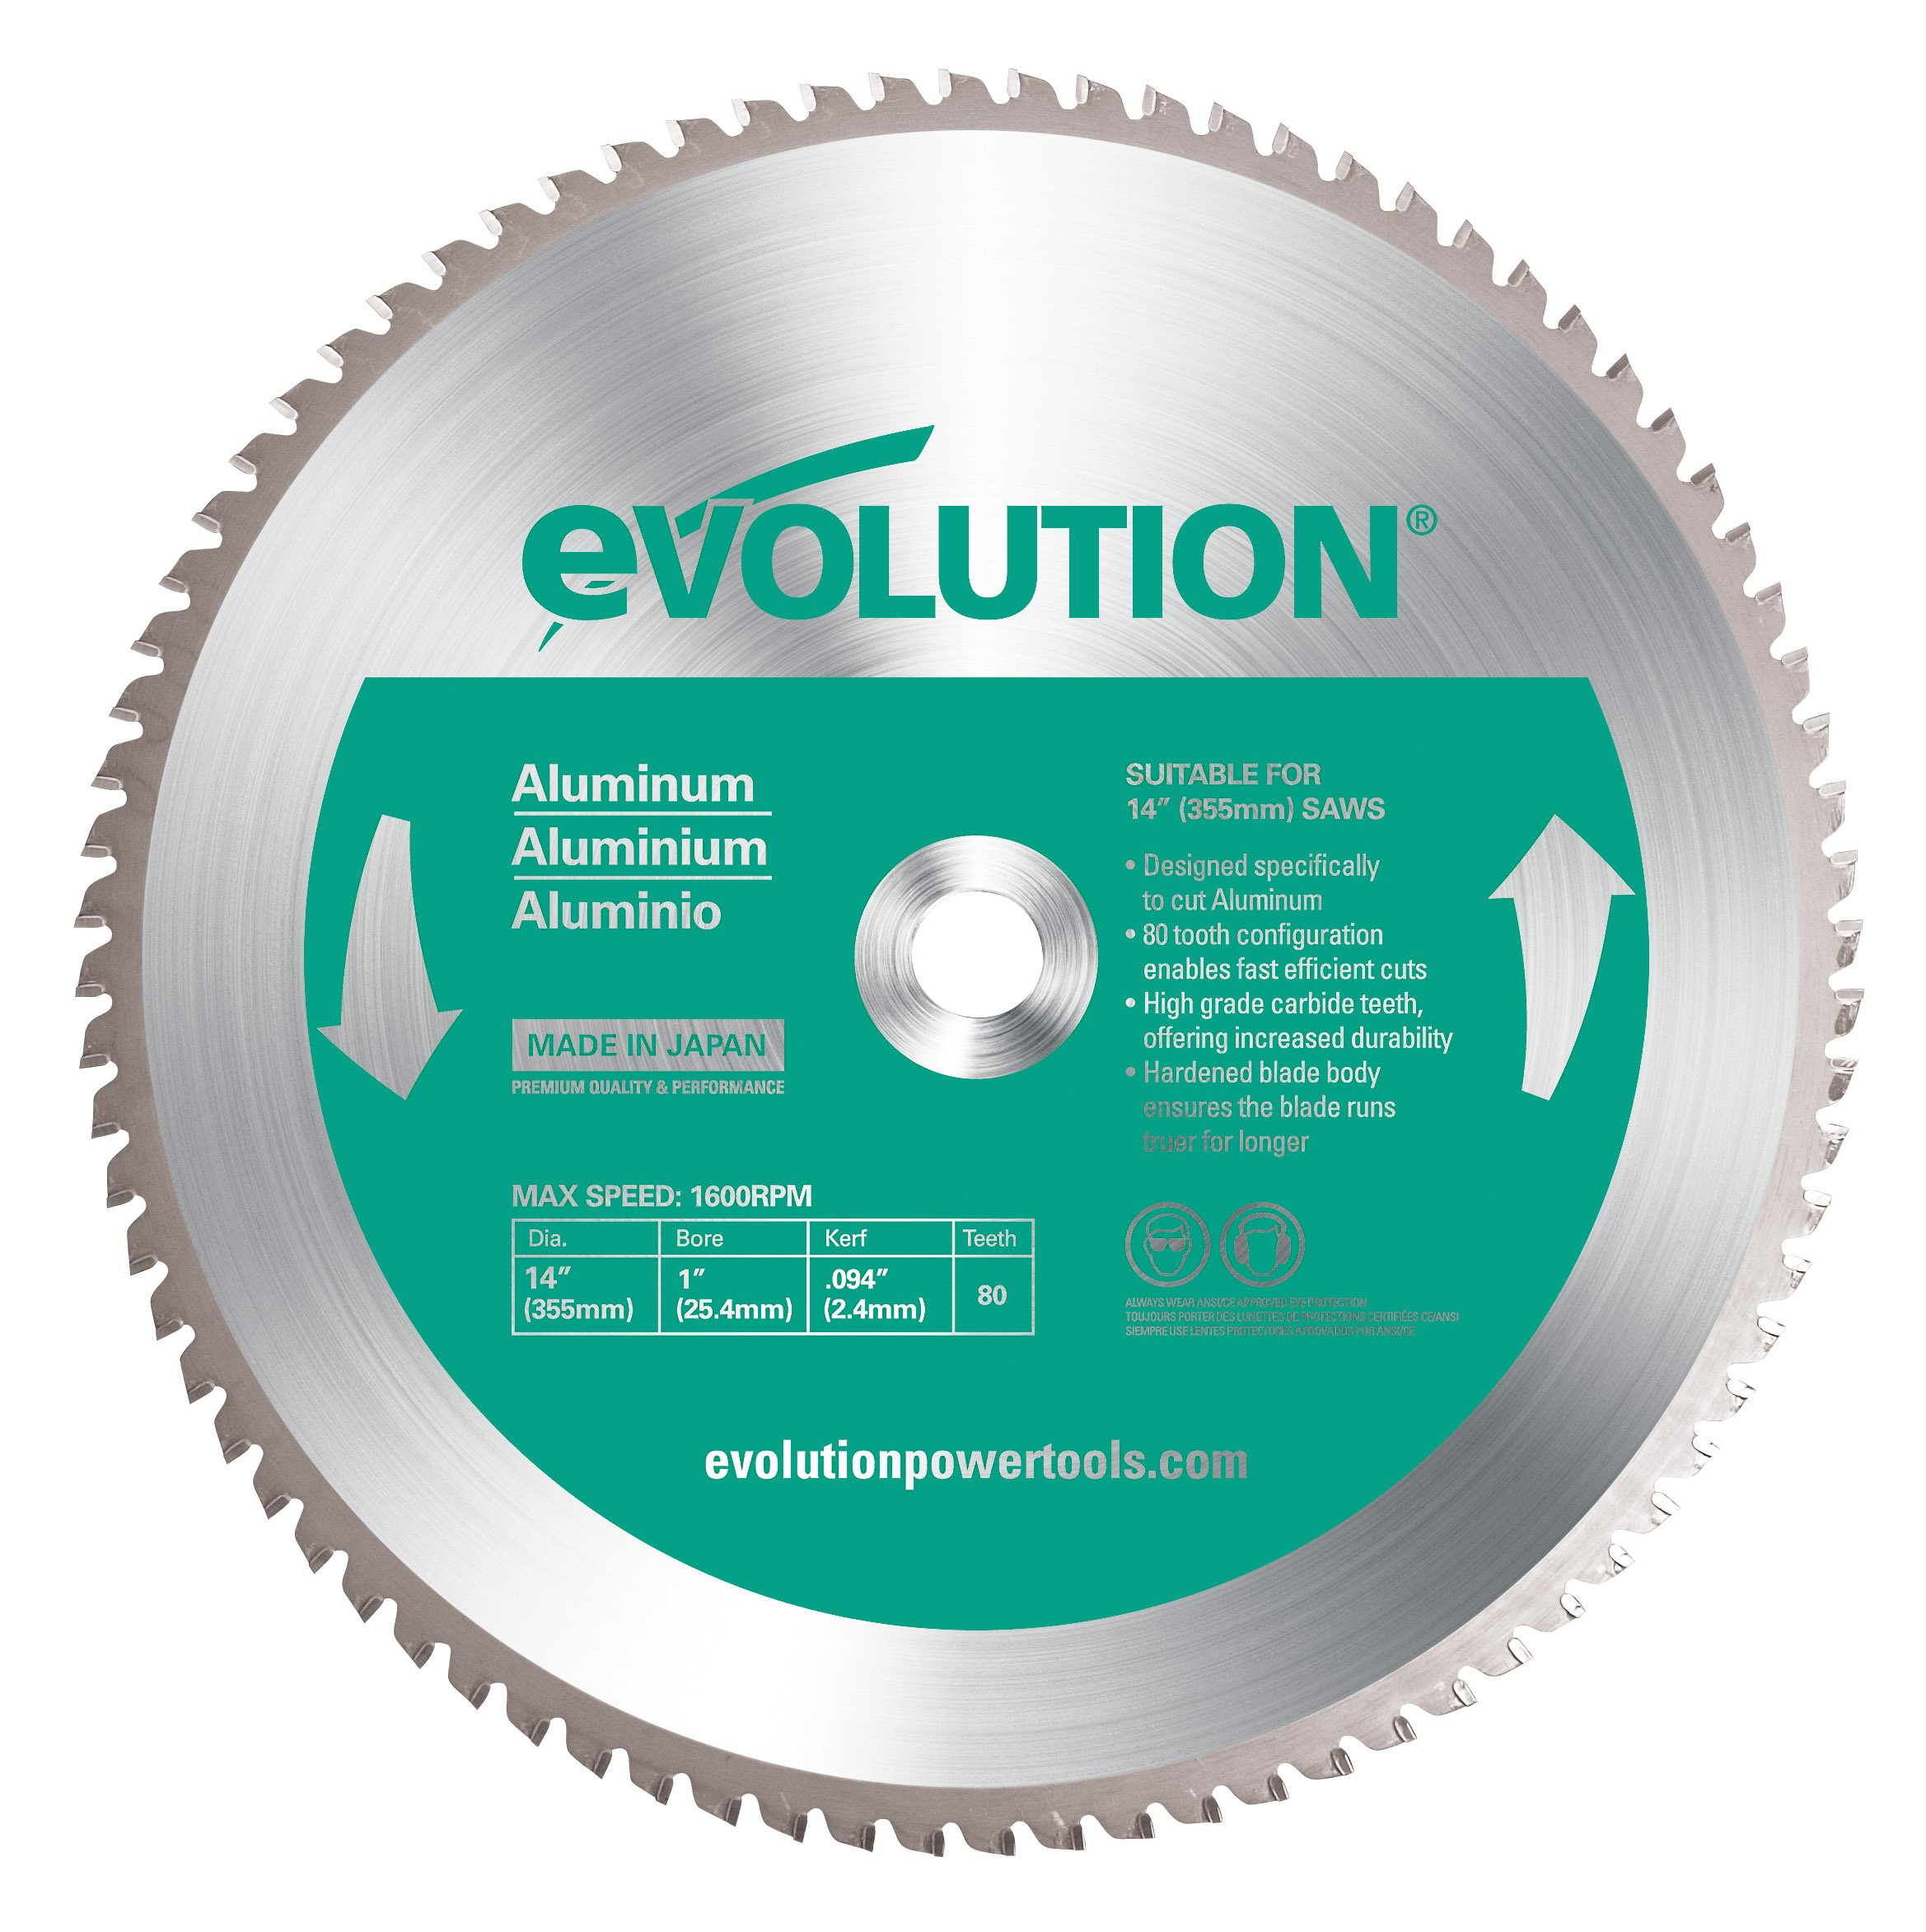 Evolution Power Tools 14BLADEAL Aluminum Cutting Saw Blade, 14-Inch x 80-Tooth by Evolution Power Tools